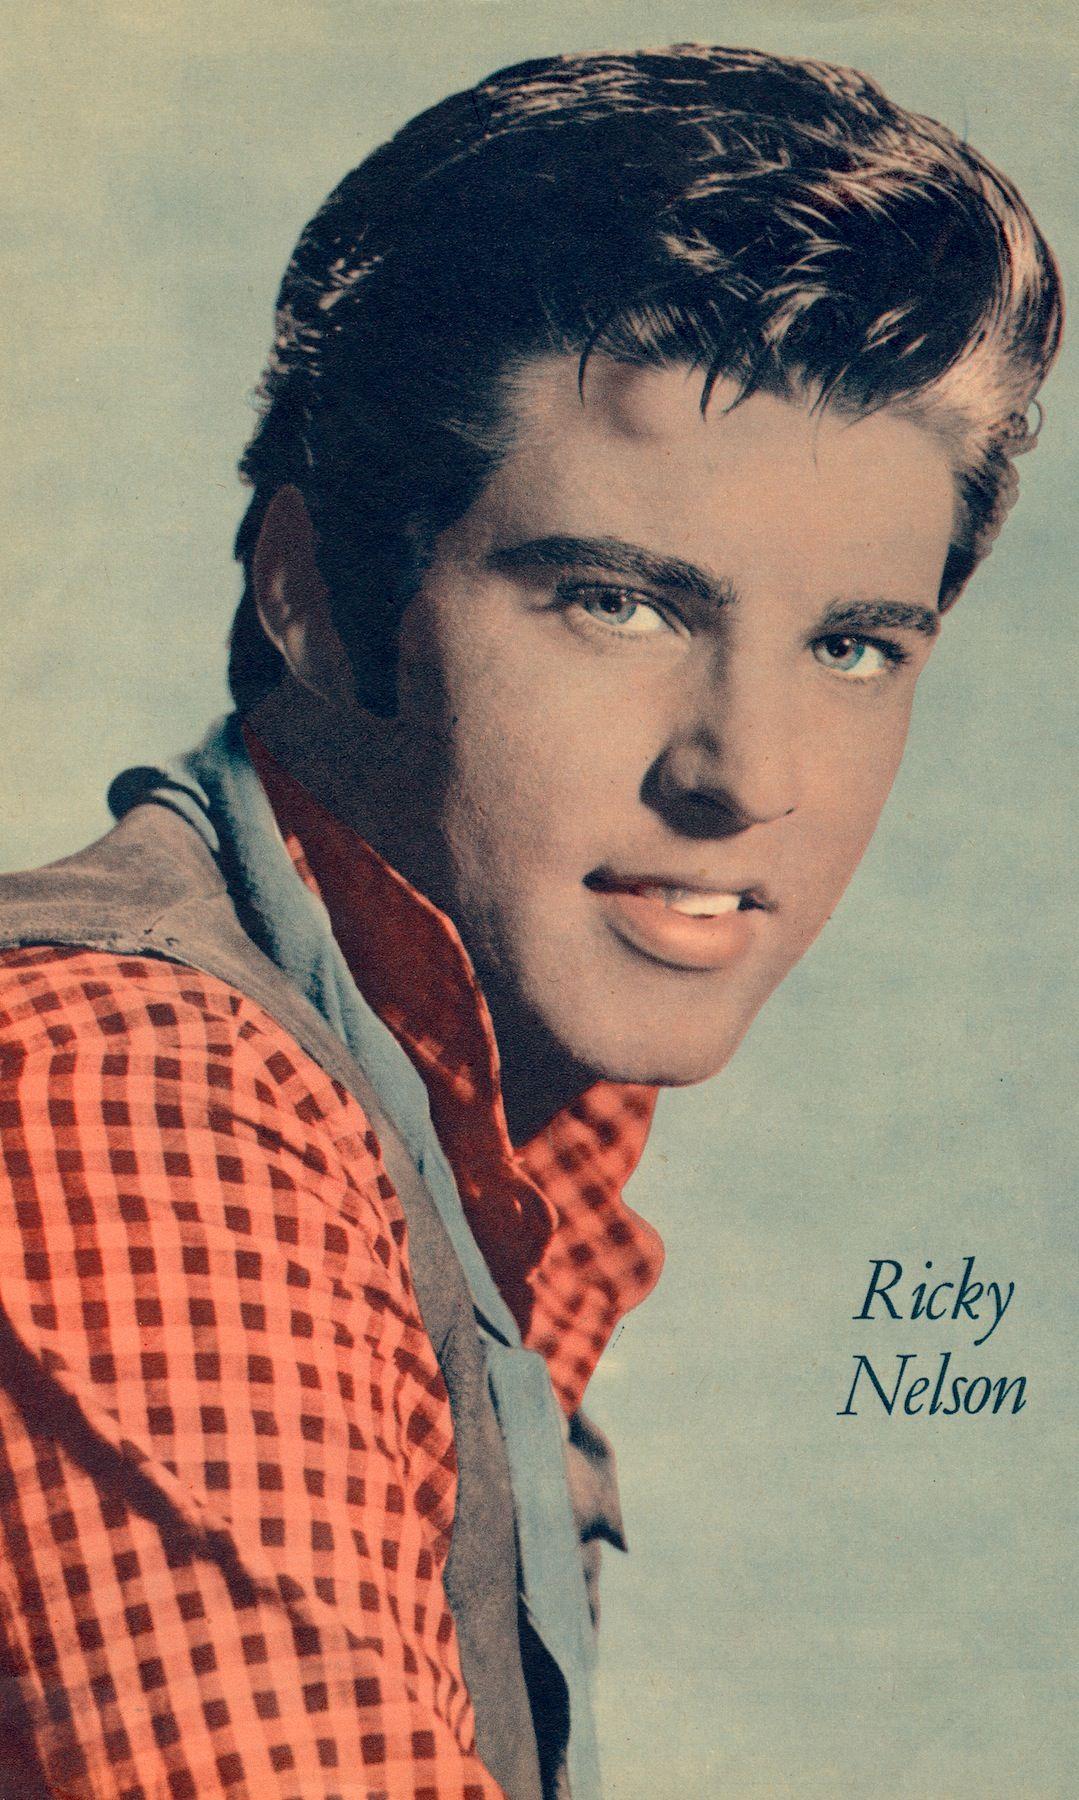 Ricky Nelson Album